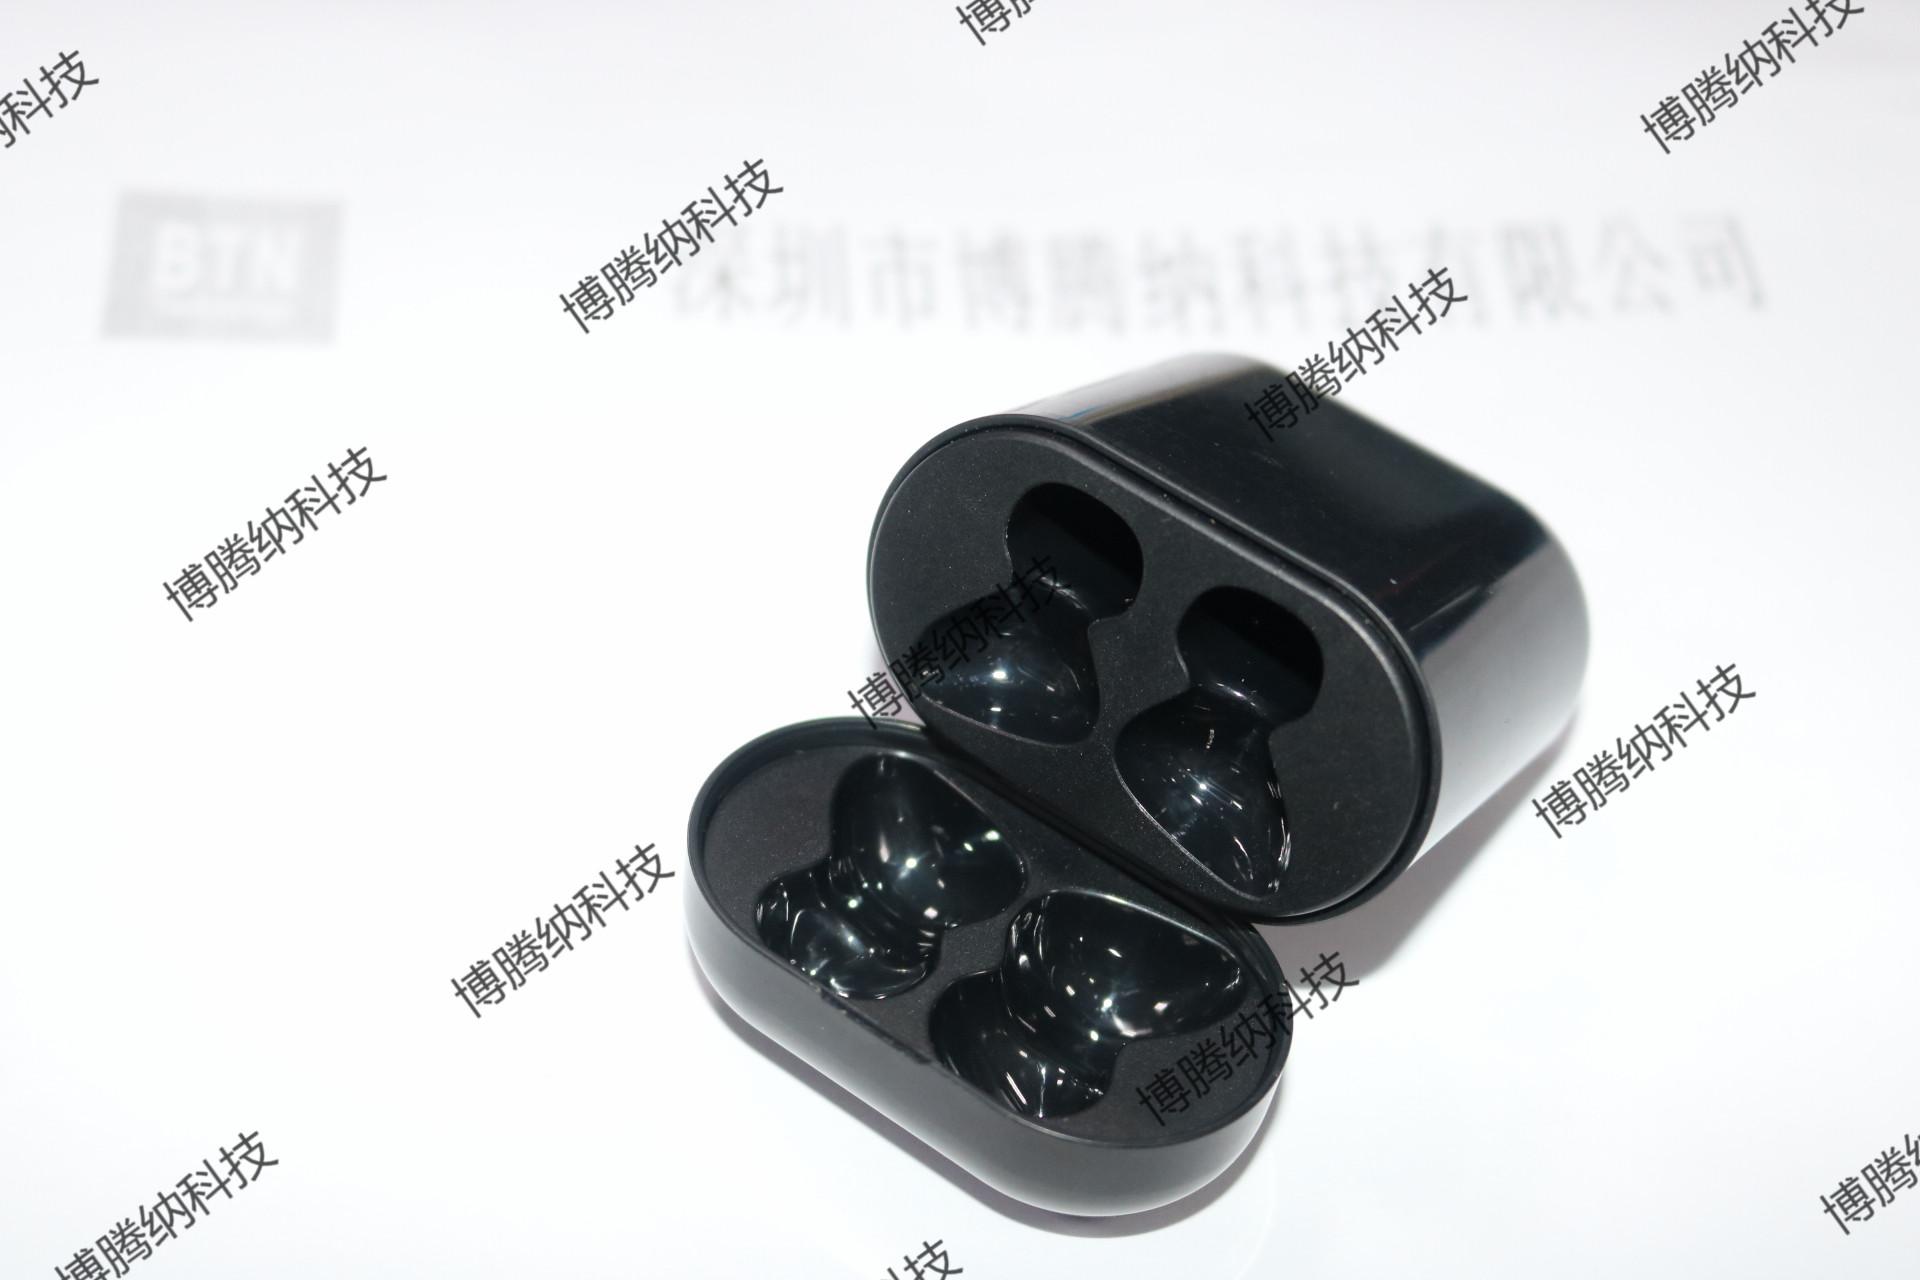 TWS蓝牙耳机塑胶模具_蓝牙耳机塑胶外壳_注塑加工